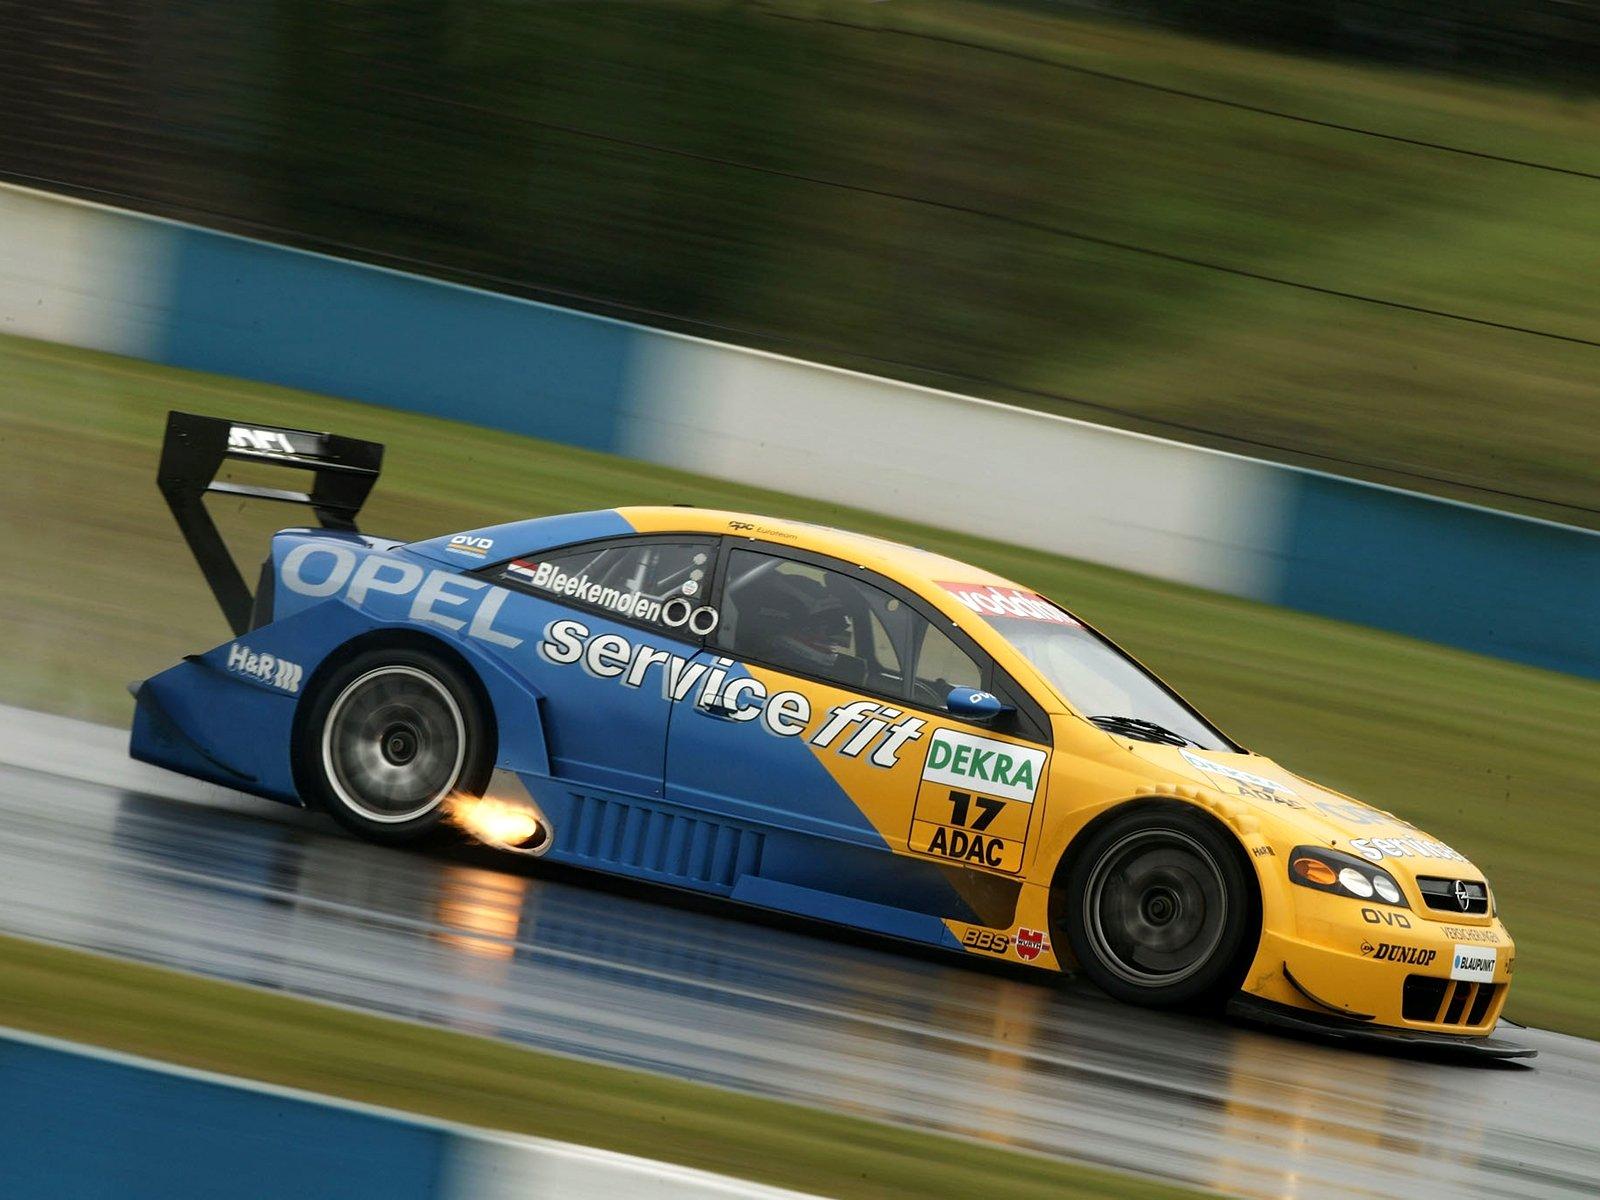 http://4.bp.blogspot.com/-JP91J05NDYo/TrURT6I0eSI/AAAAAAAACKg/c214Pfgsqig/s1600/Opel-Astra-DTM-2.jpg